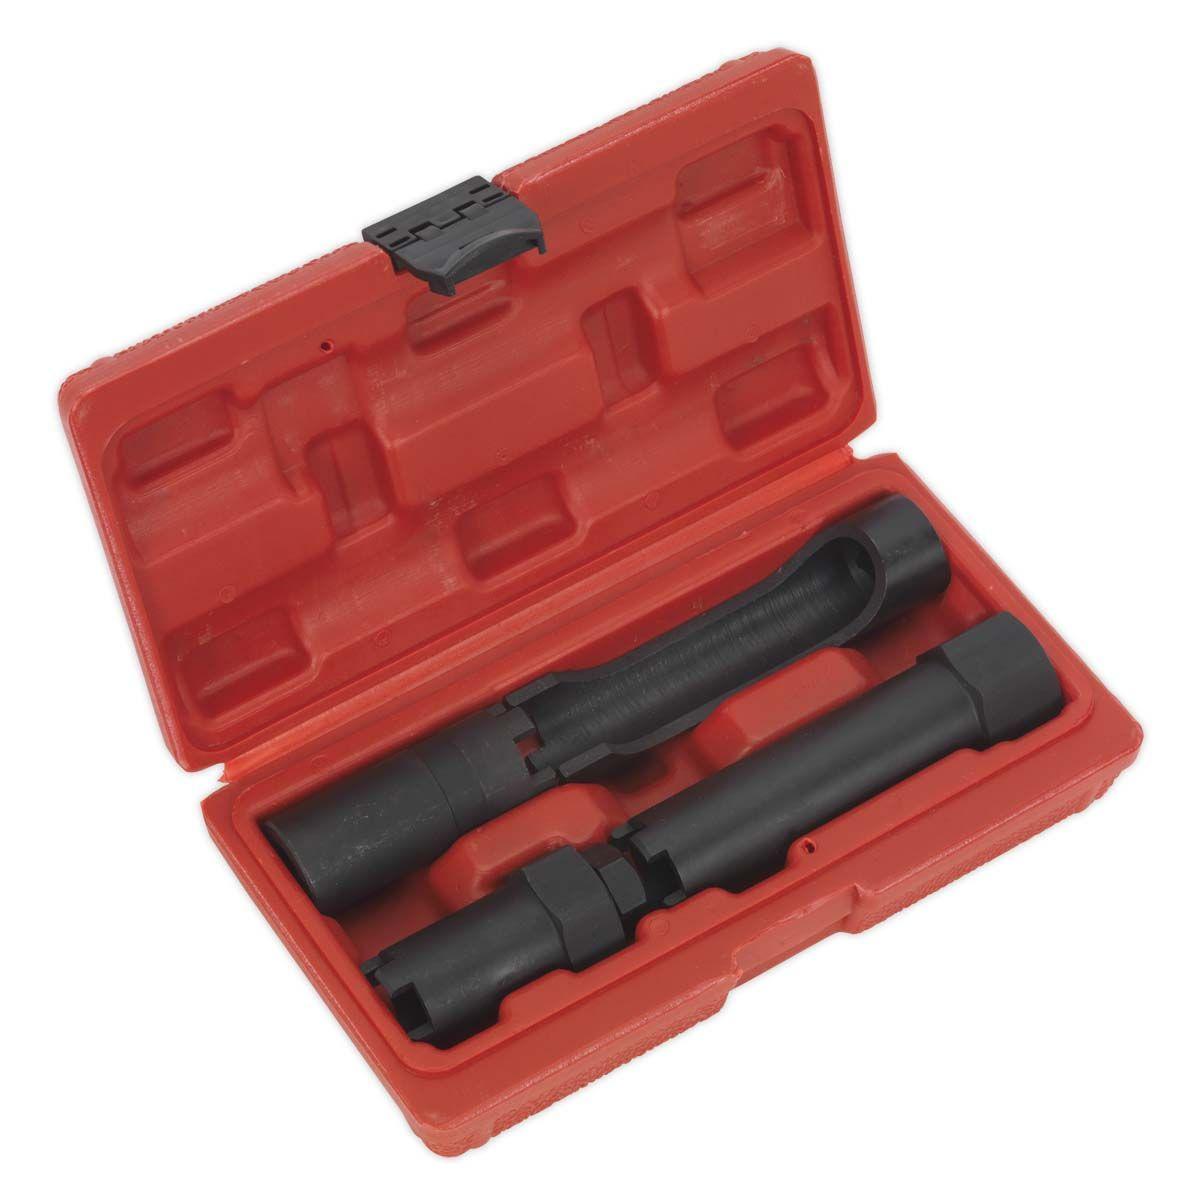 Sealey Diesel Injector Socket Set 4pc - Commercial